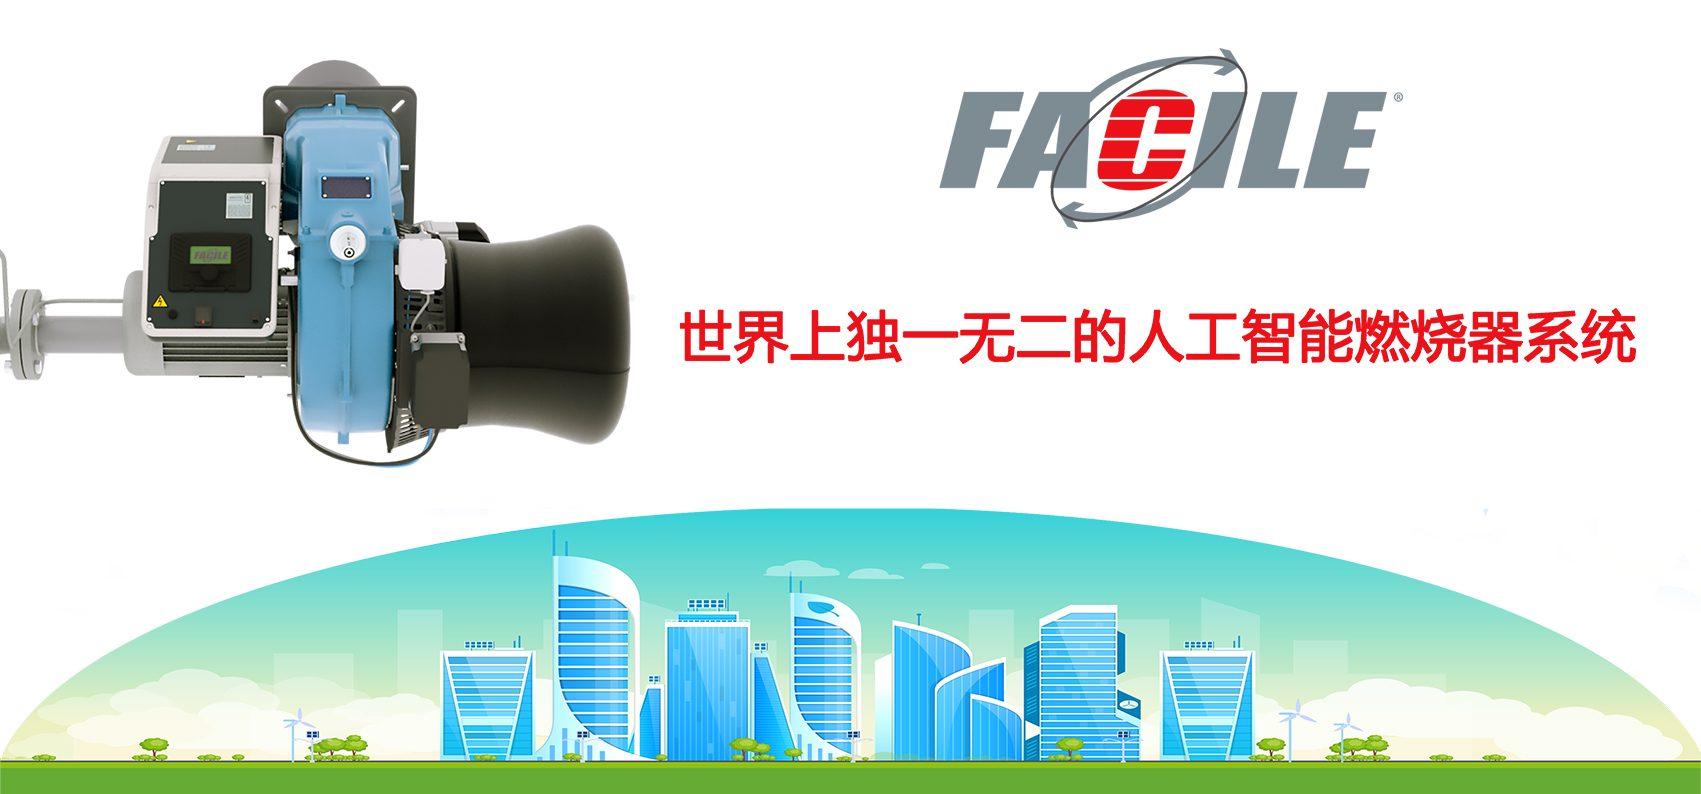 FACILE CIB Unigas 世界上独一无二的人工智能燃烧器系统